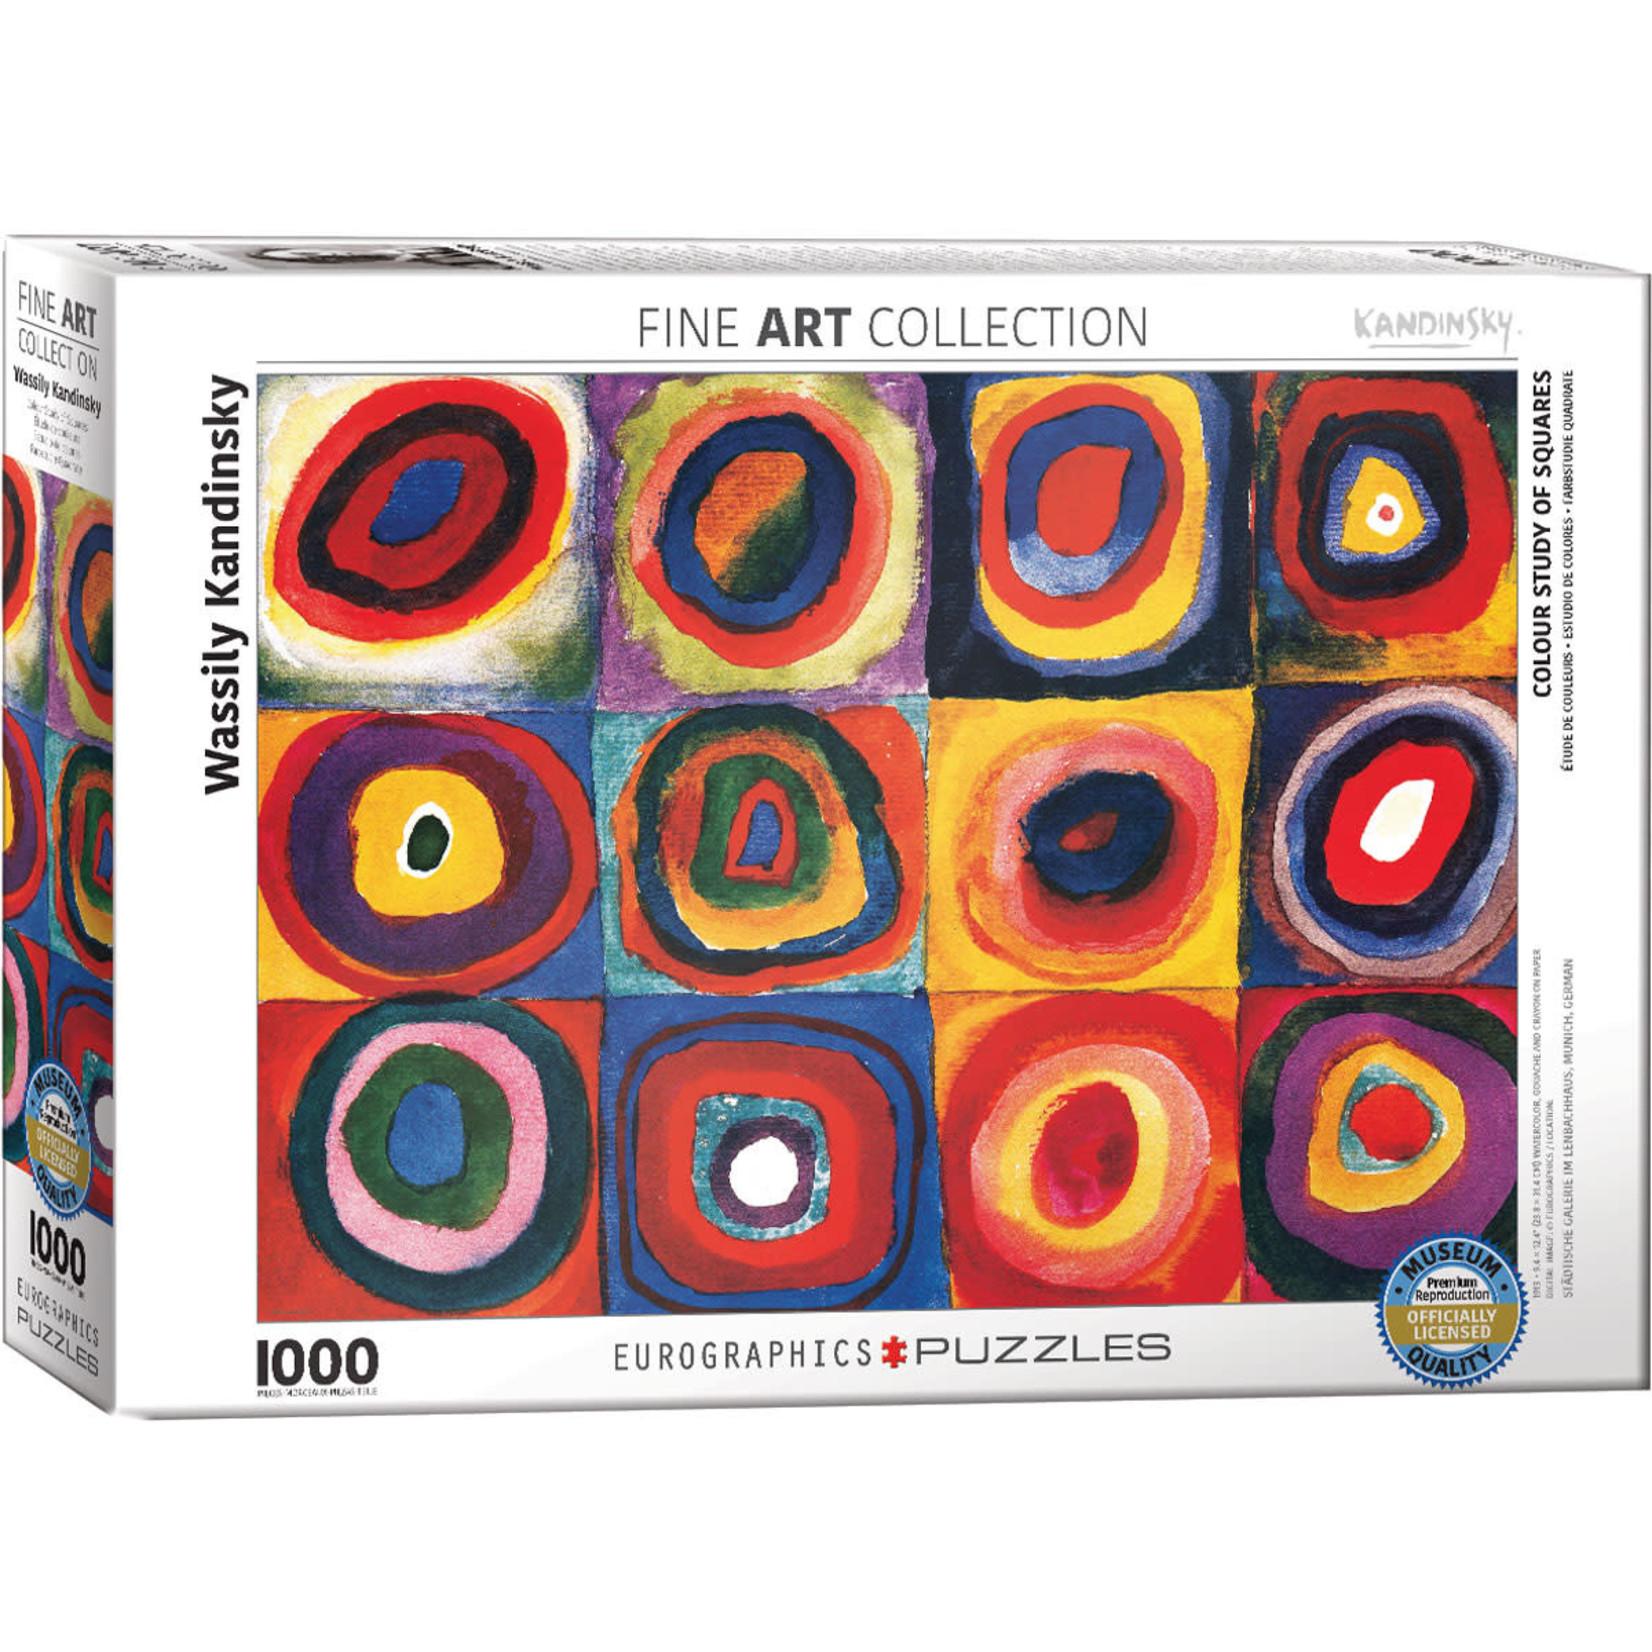 Eurographics Eurographics Puzzle: Colour Study of Squares - 1000pc